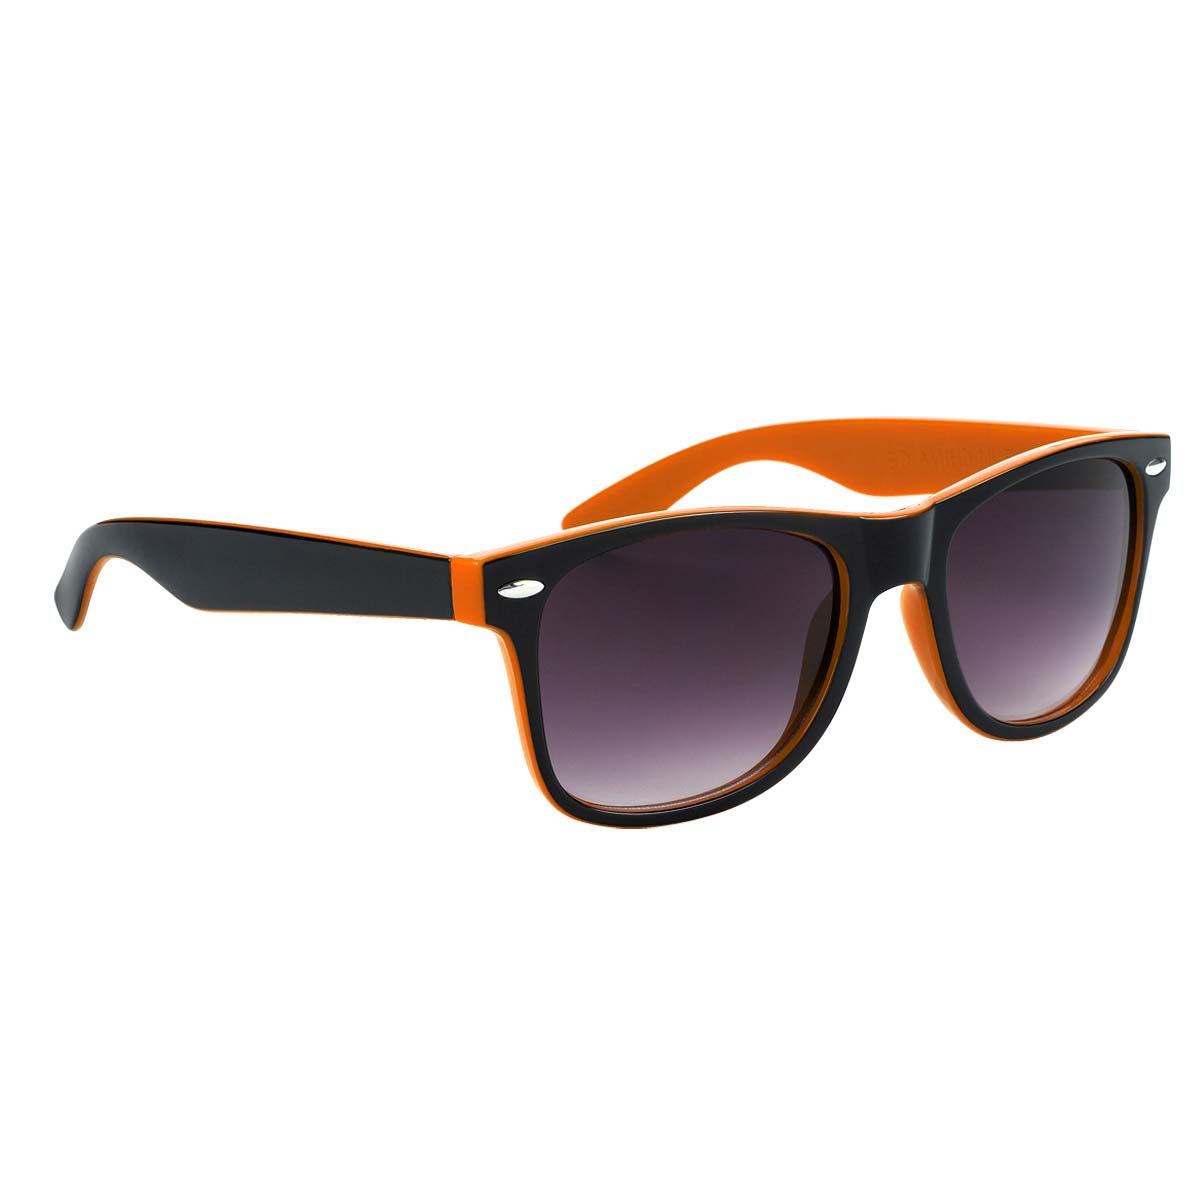 6224 orange black